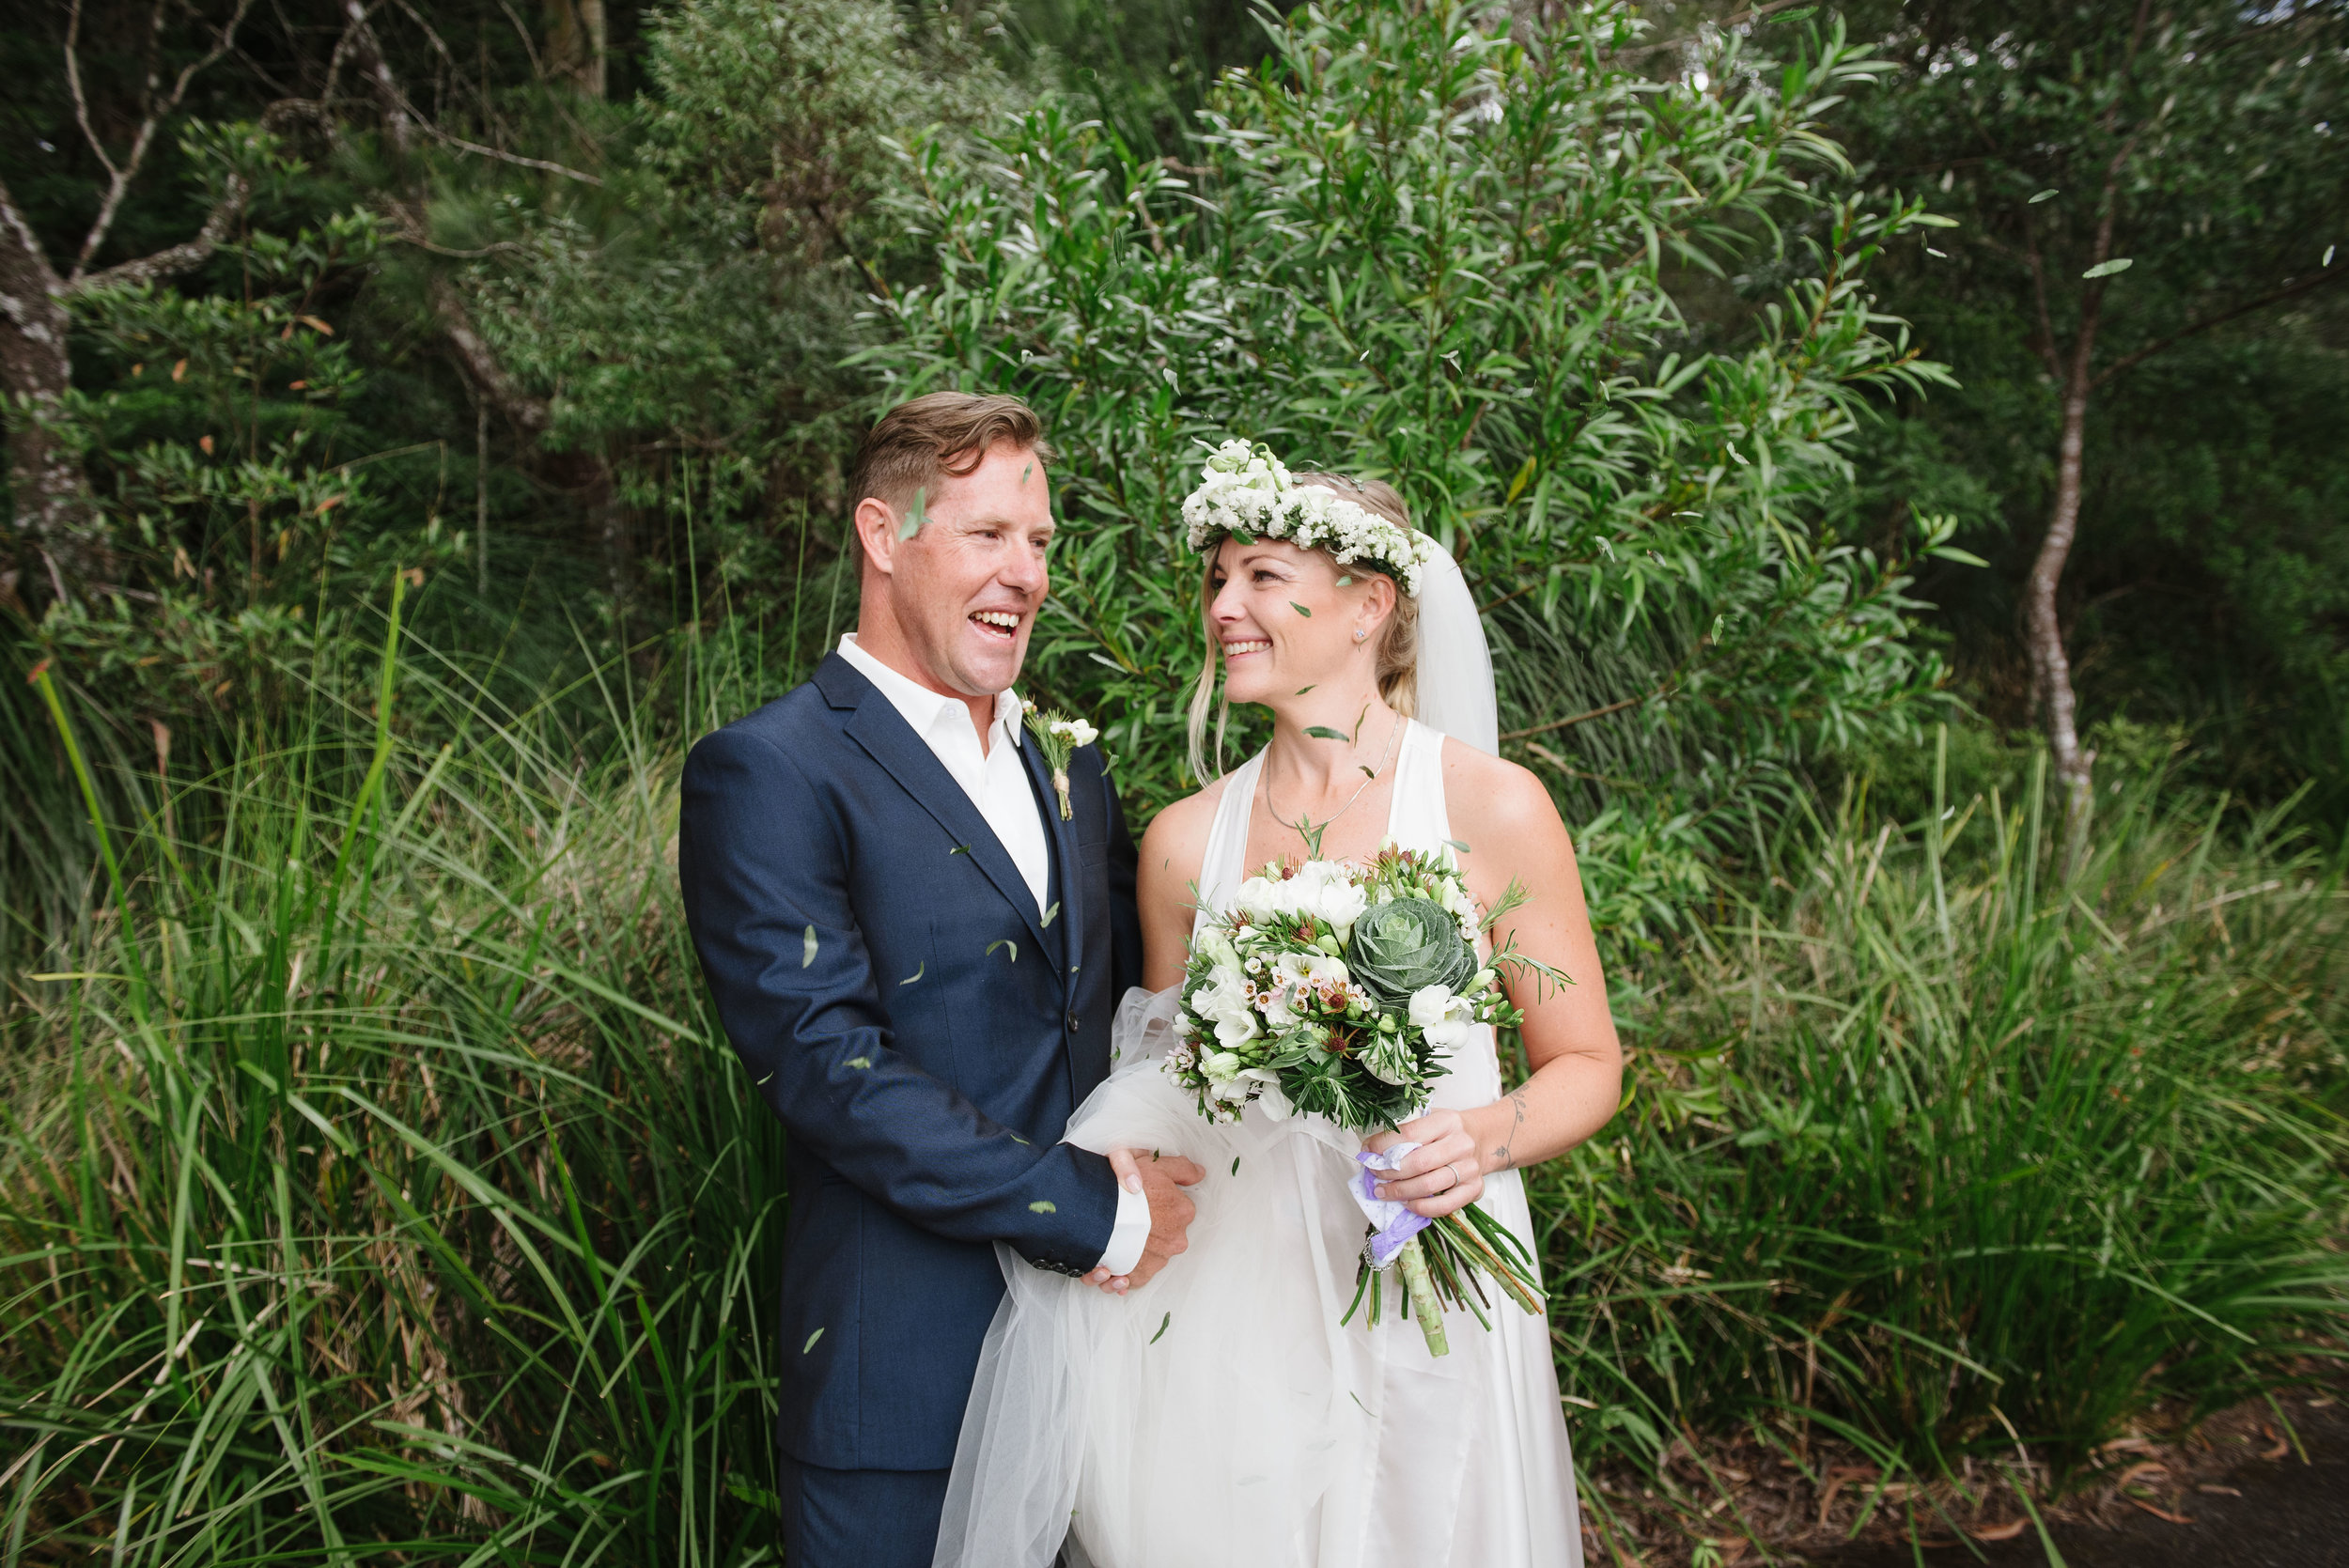 Carla and Luke- wedding photographer, byron bay wedding and family photographer, tweed heads wedding and family photography-221.jpg